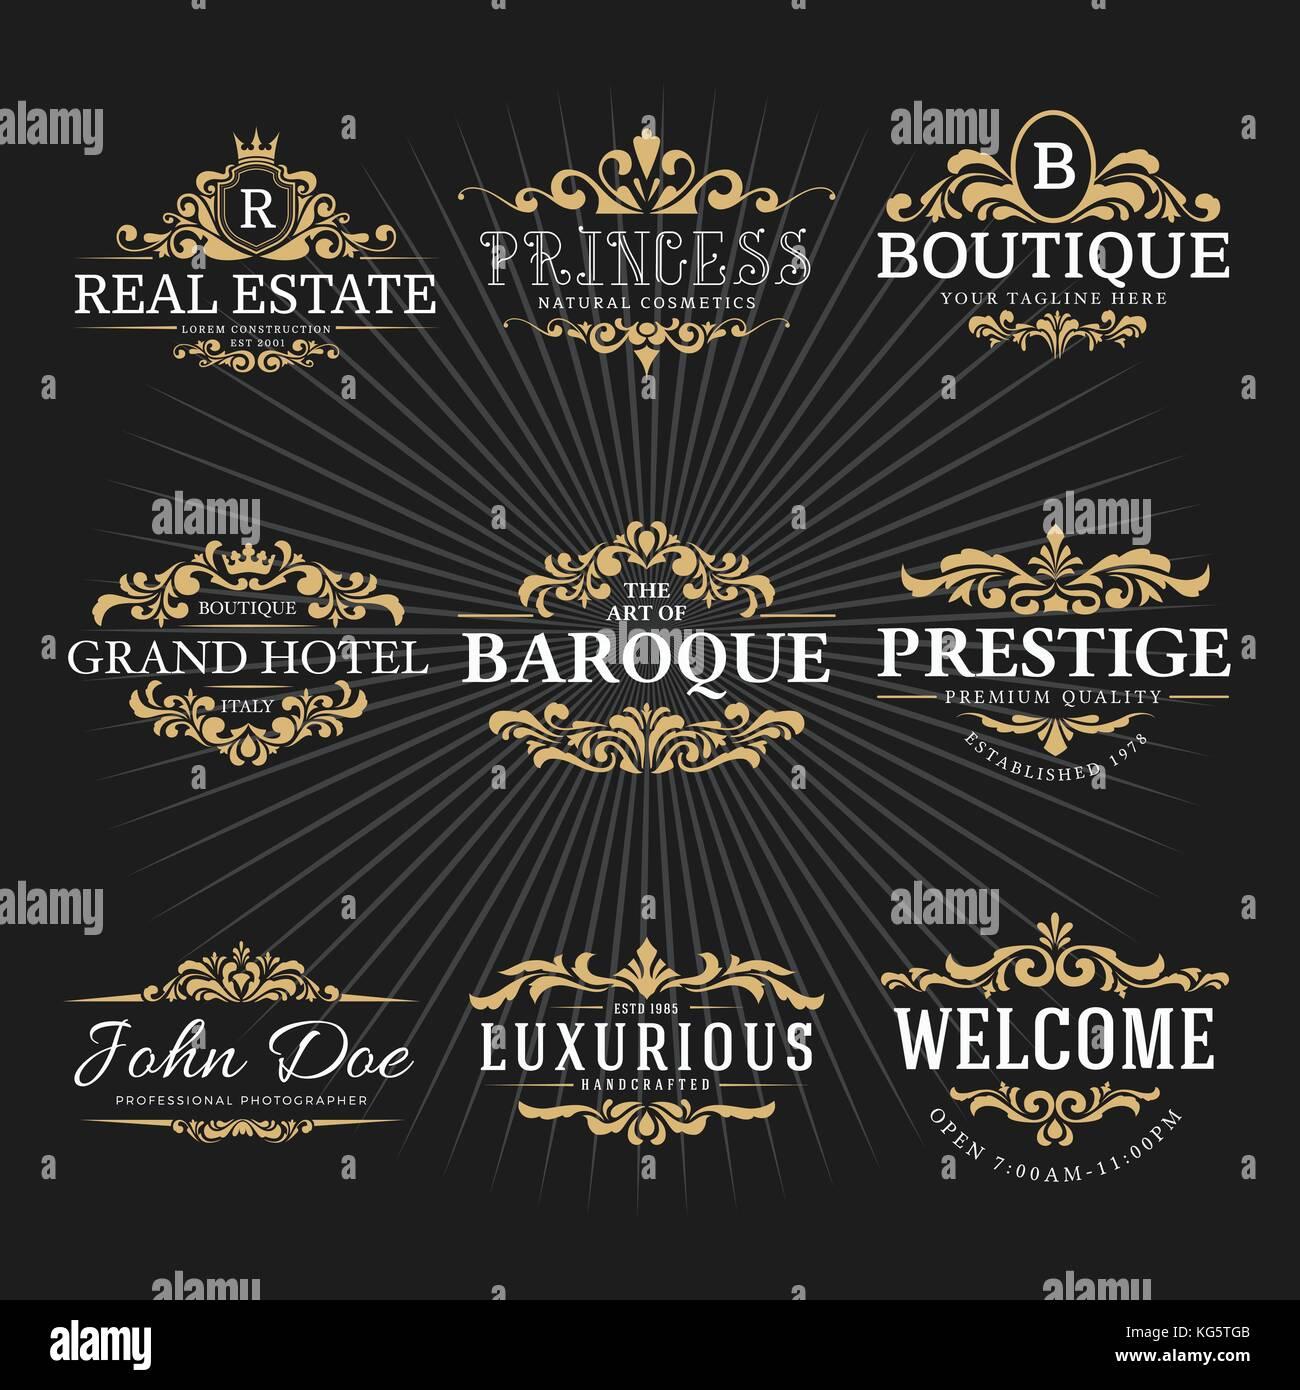 Vintage royal flourish frame logo decorative design for banner stock vintage royal flourish frame logo decorative design for banner sticker label tags invitation vector illustration stopboris Gallery